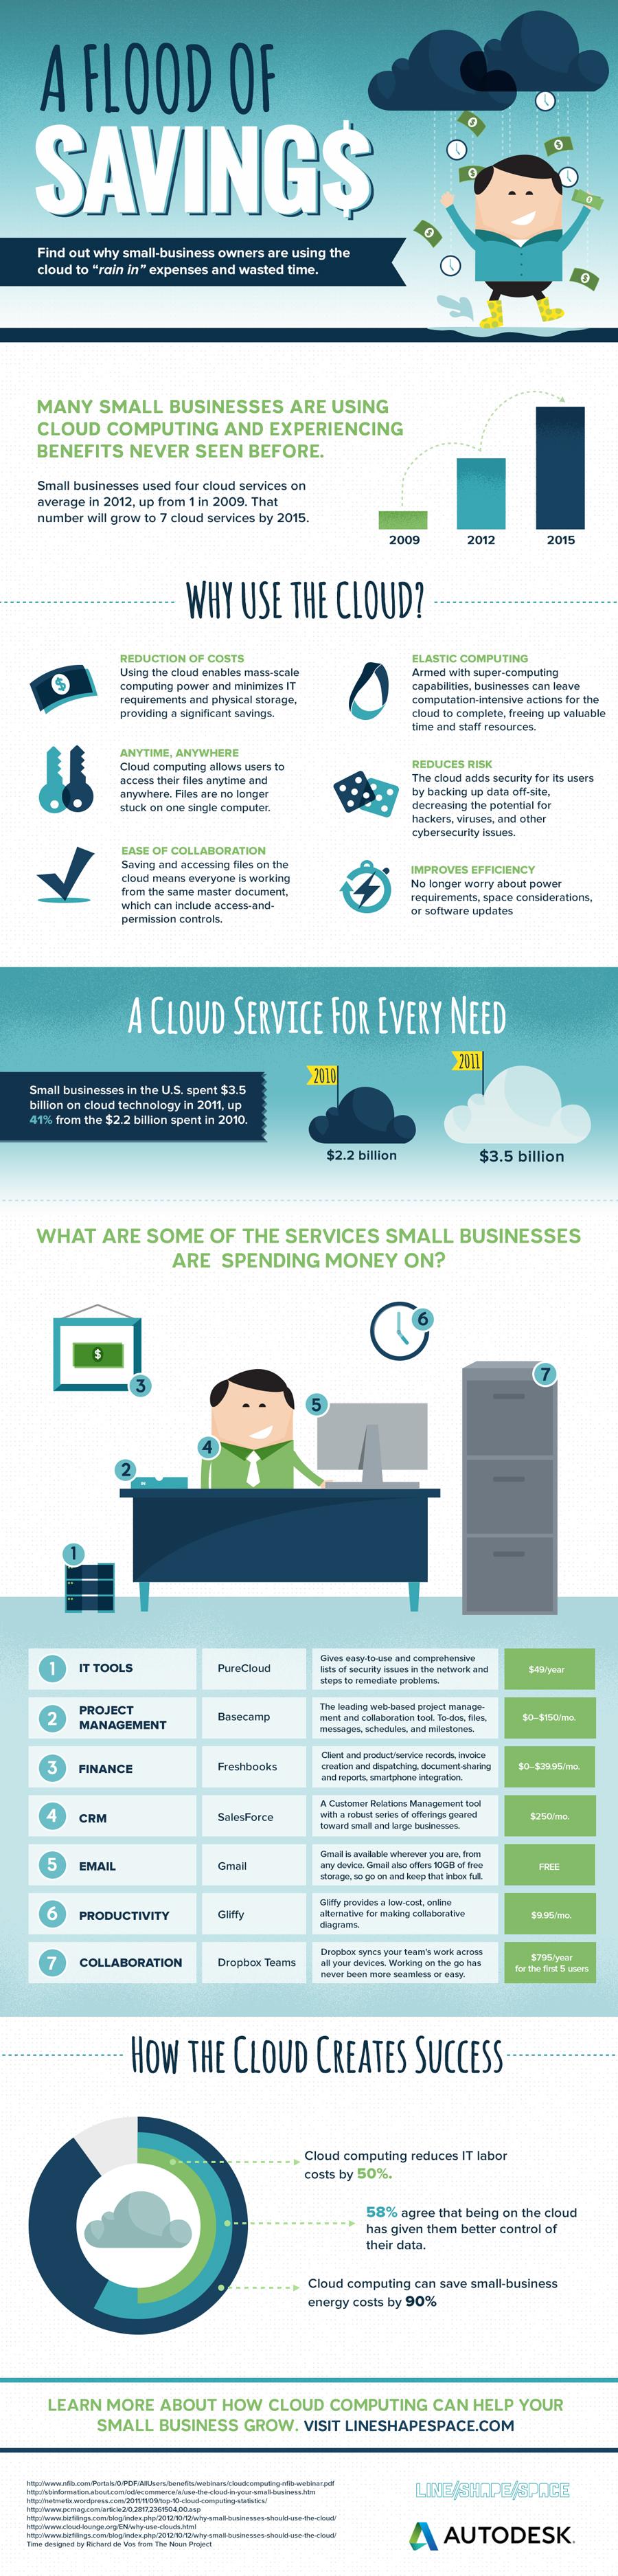 A Flood Of Savings: Cloud Computing For Business